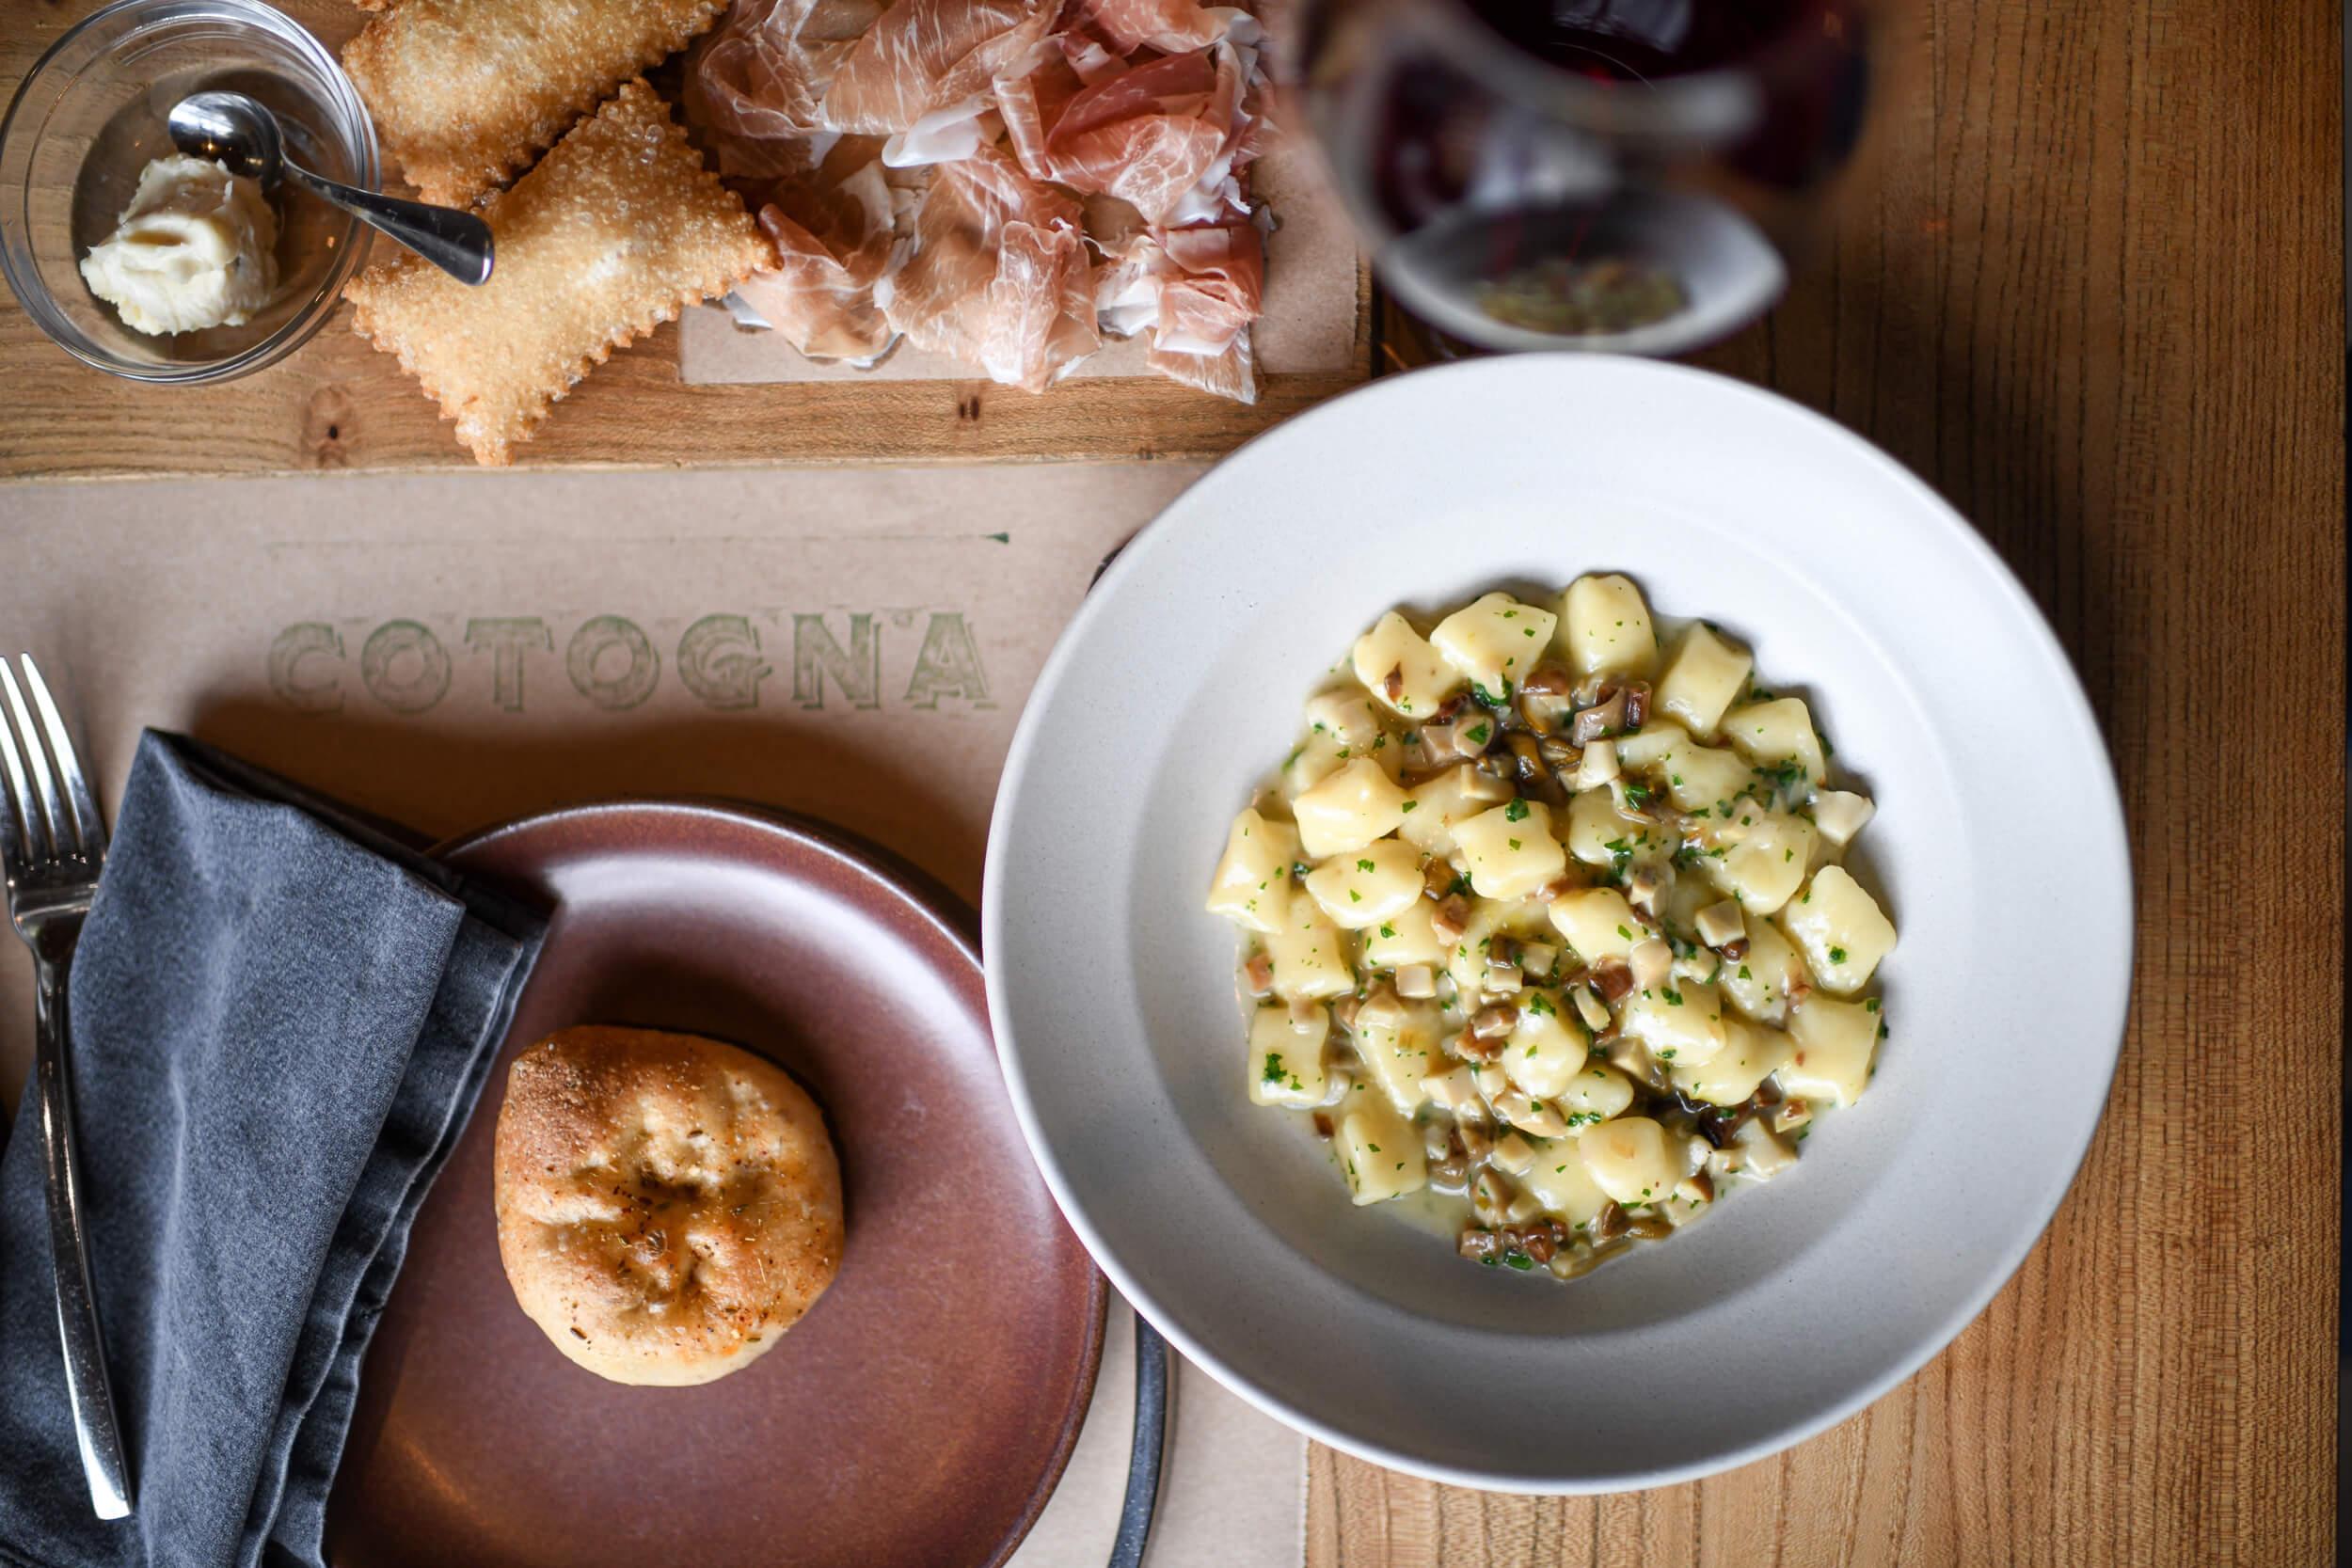 a plate of fresh Gnocchi